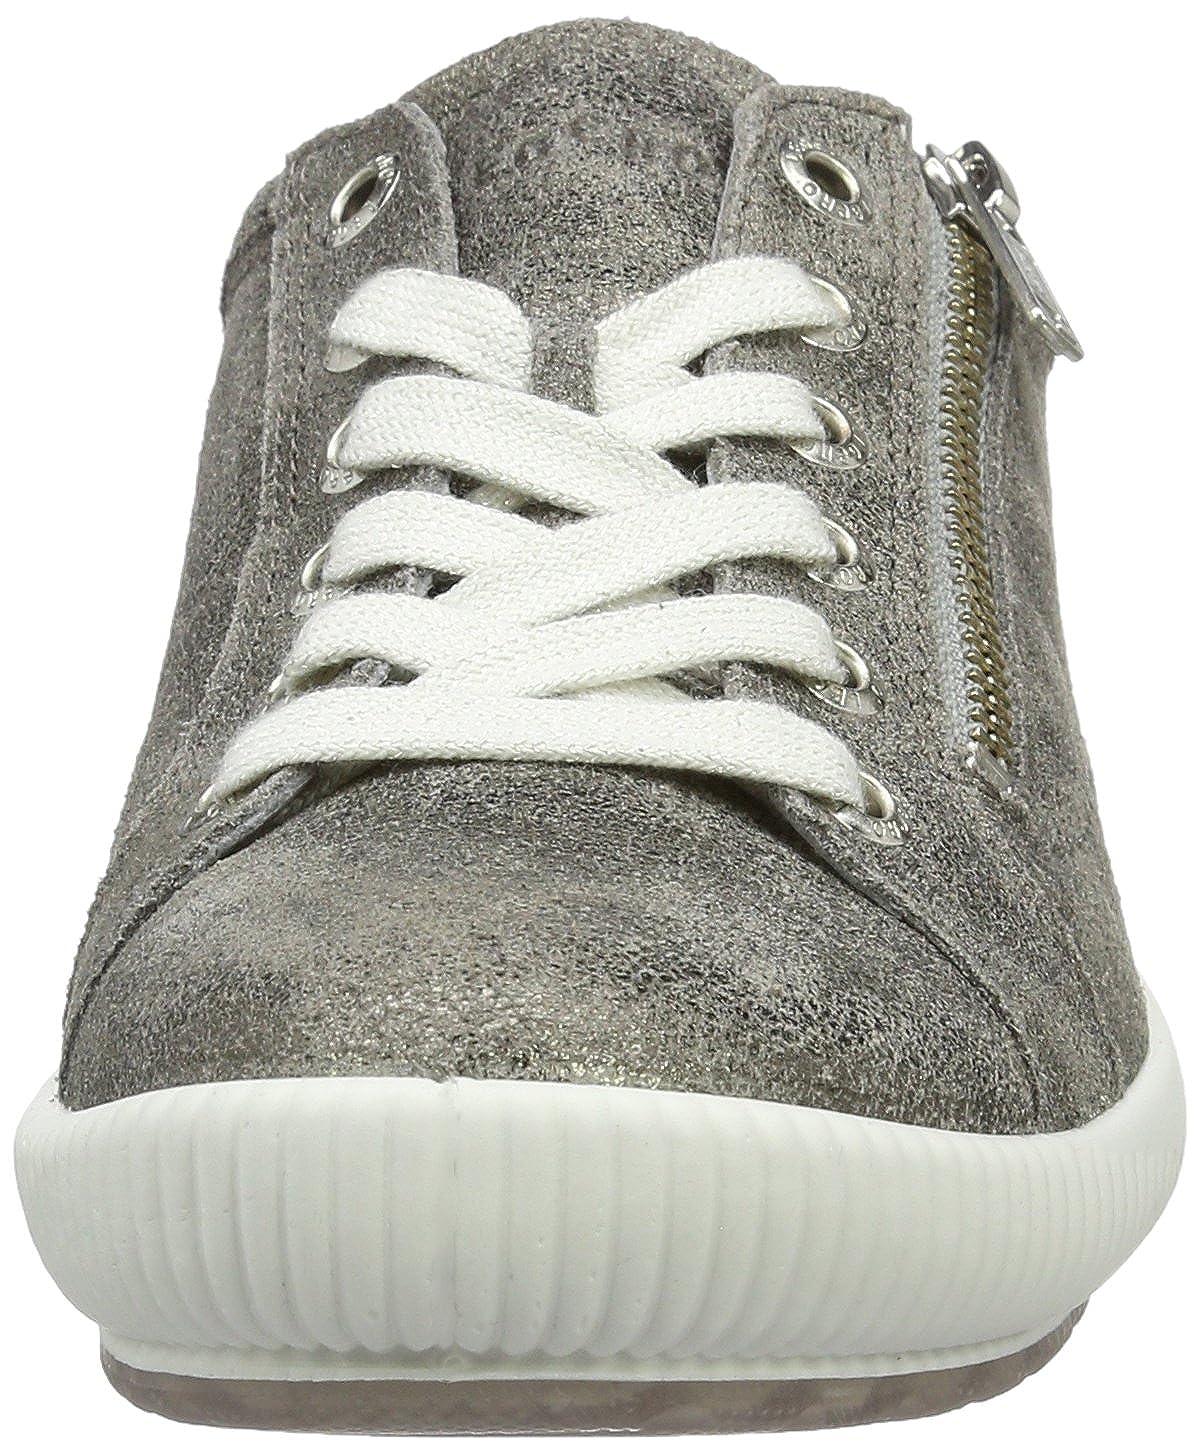 Legero 38) Tanaro Damen Sneakers Grau (Taupe 38) Legero 2932e9